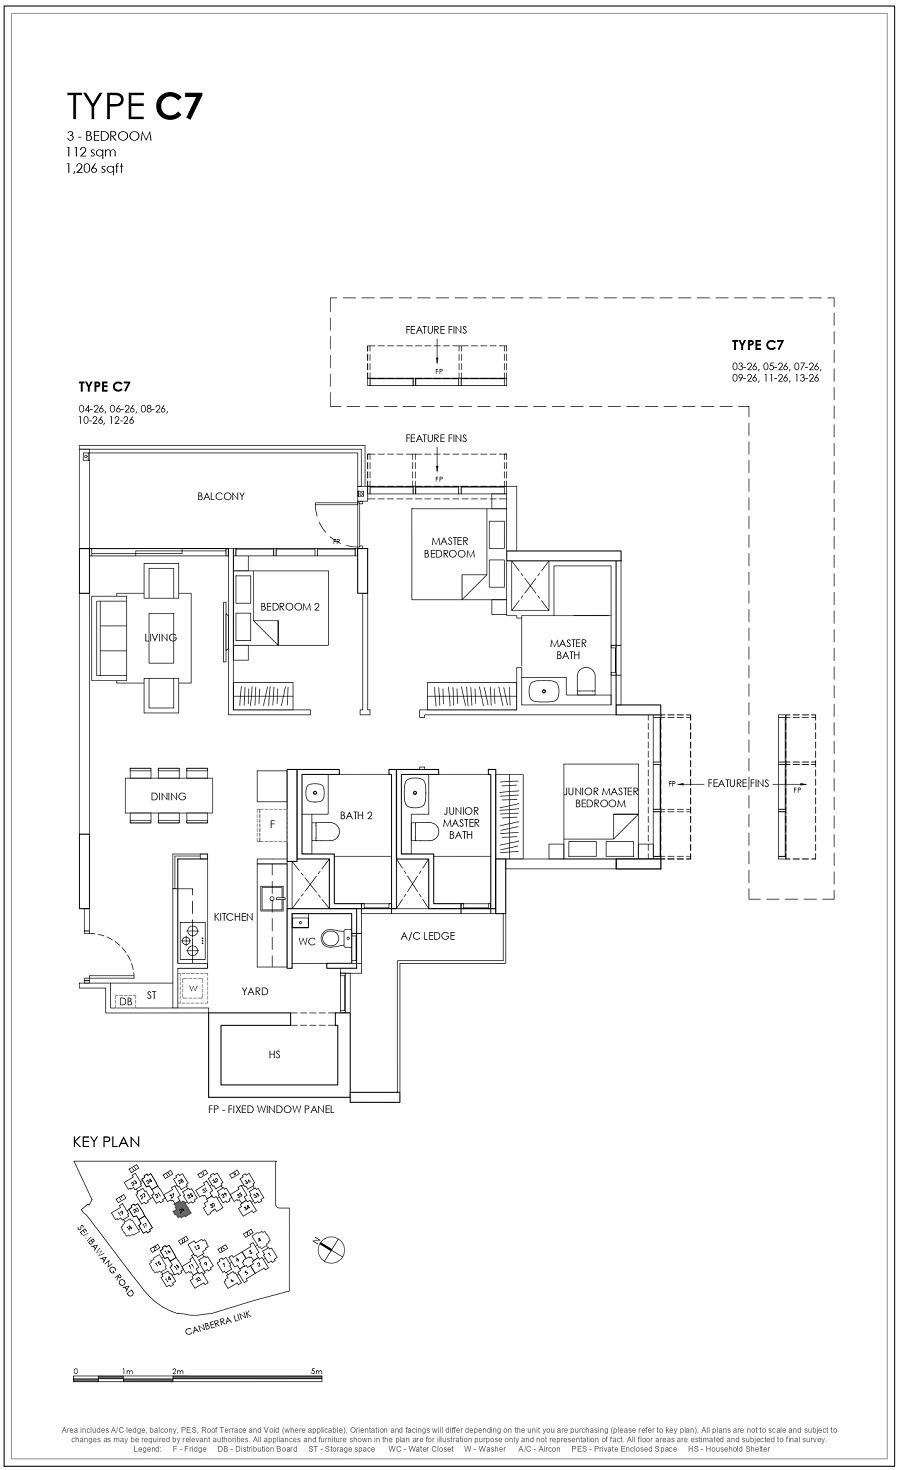 Provence Residence EC 3BR Type C7 112_1206